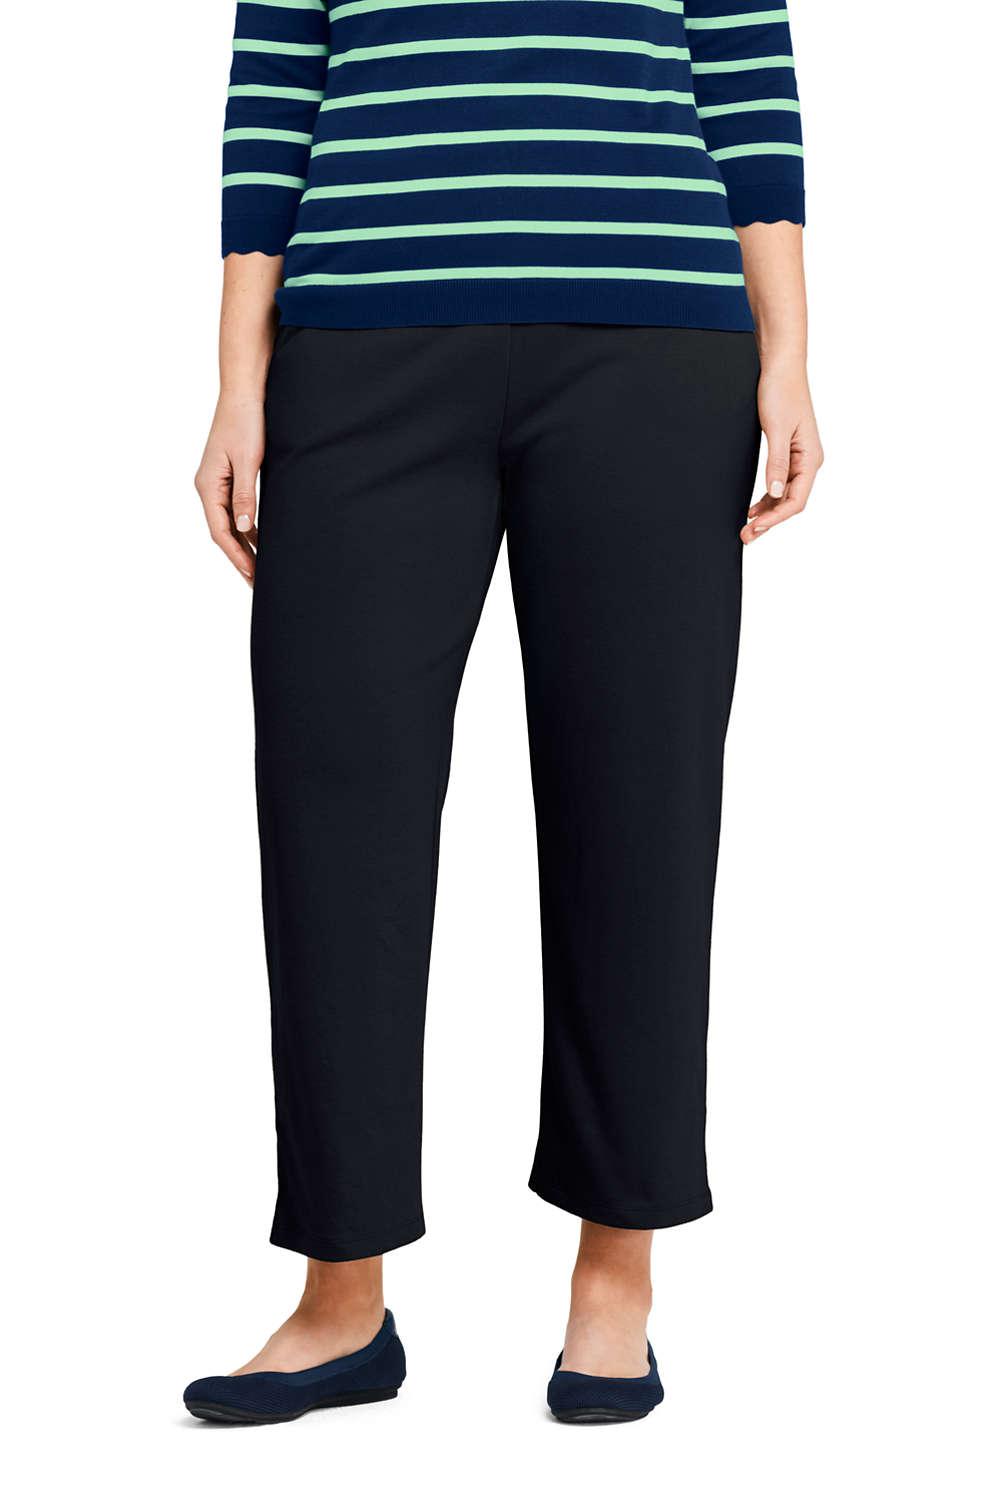 7b4f2684d60c Women's Plus Size Sport Knit Wide Leg Crop Pants from Lands' End